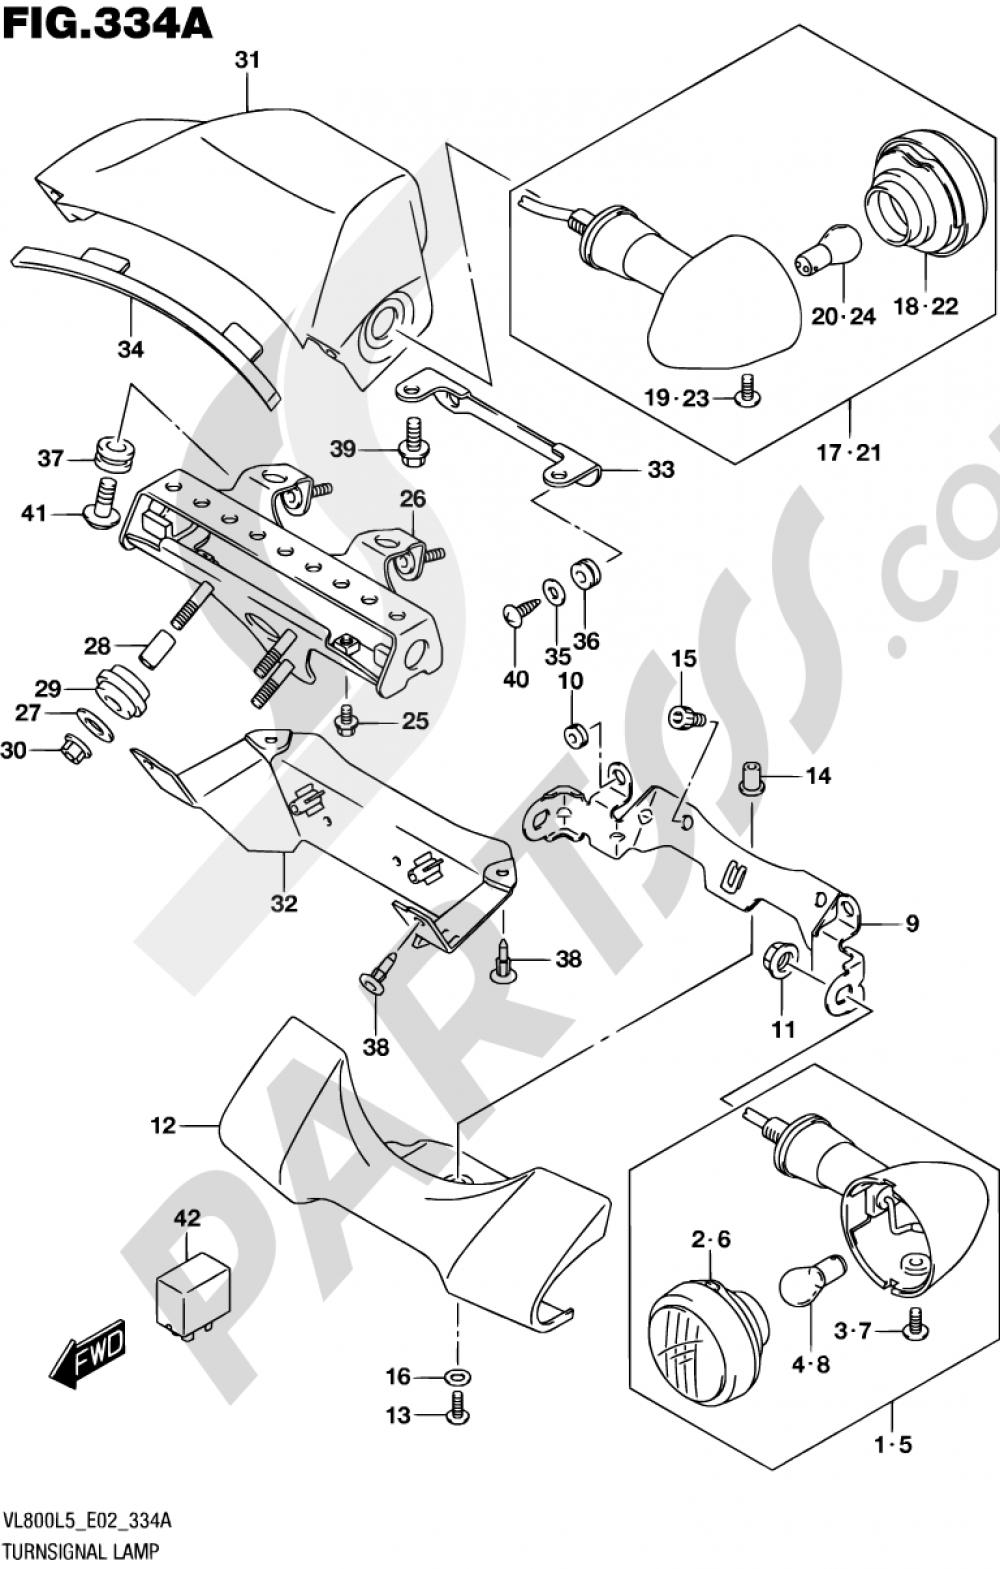 334A - TURNSIGNAL LAMP (VL800L5 E02) Suzuki INTRUDER VL800 2015